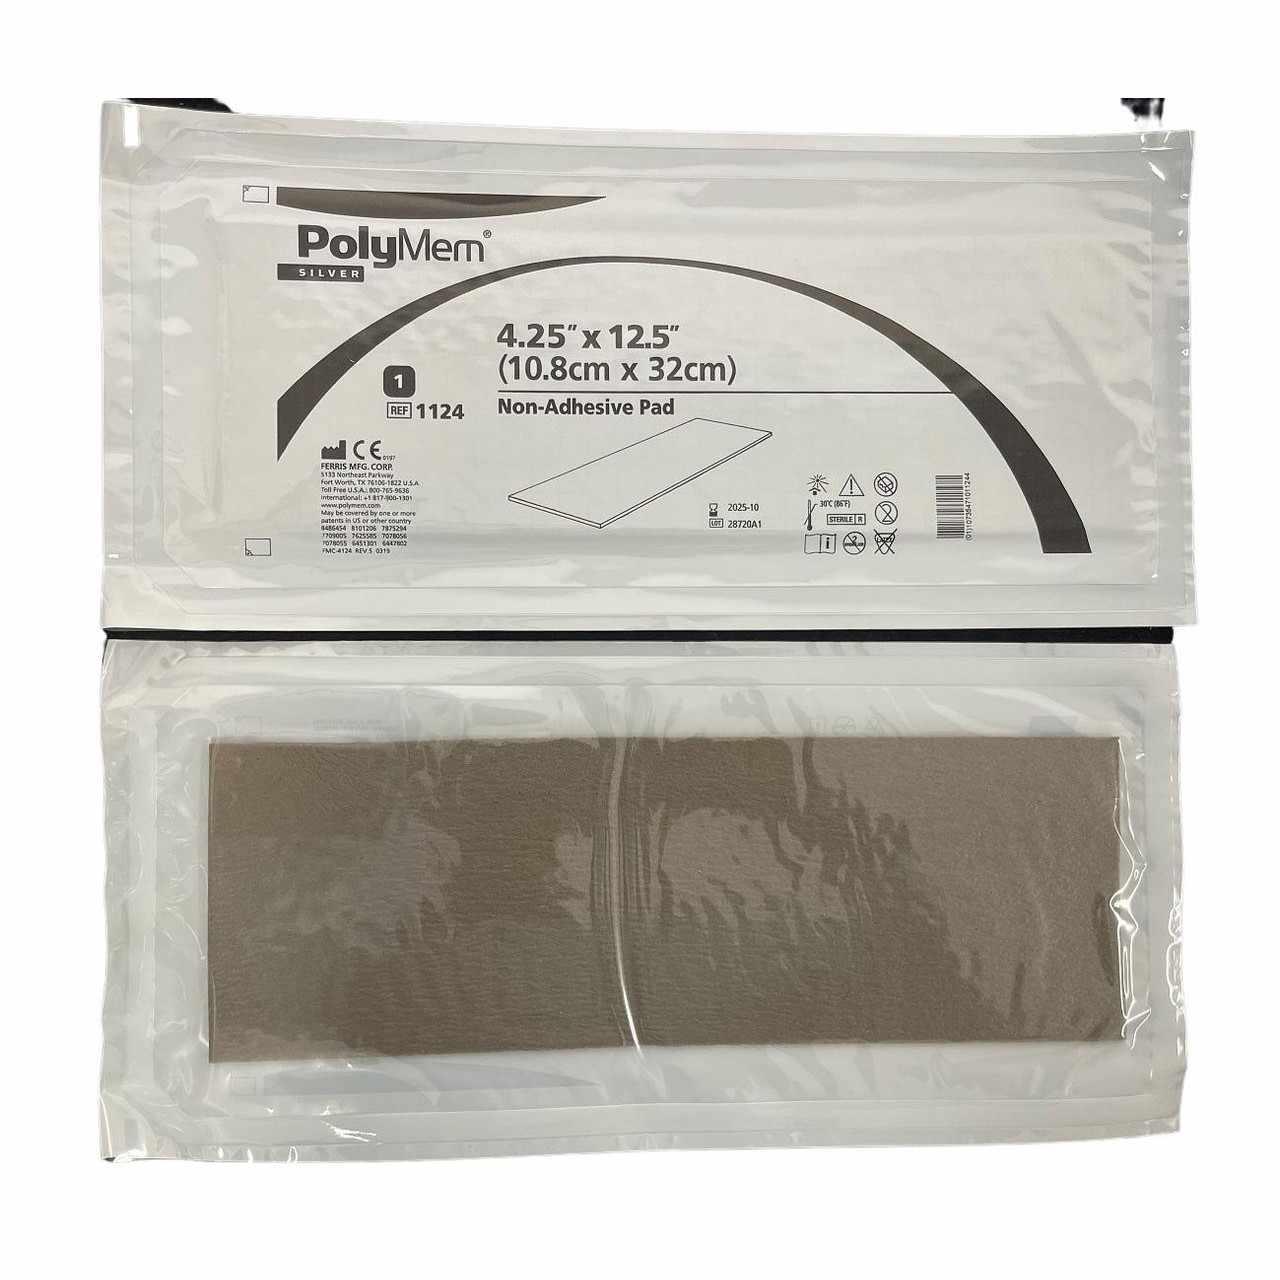 Ferris PolyMem Silver Non-Adhesive Pad Dressing, 4.25 Inch x 12.5 Inch